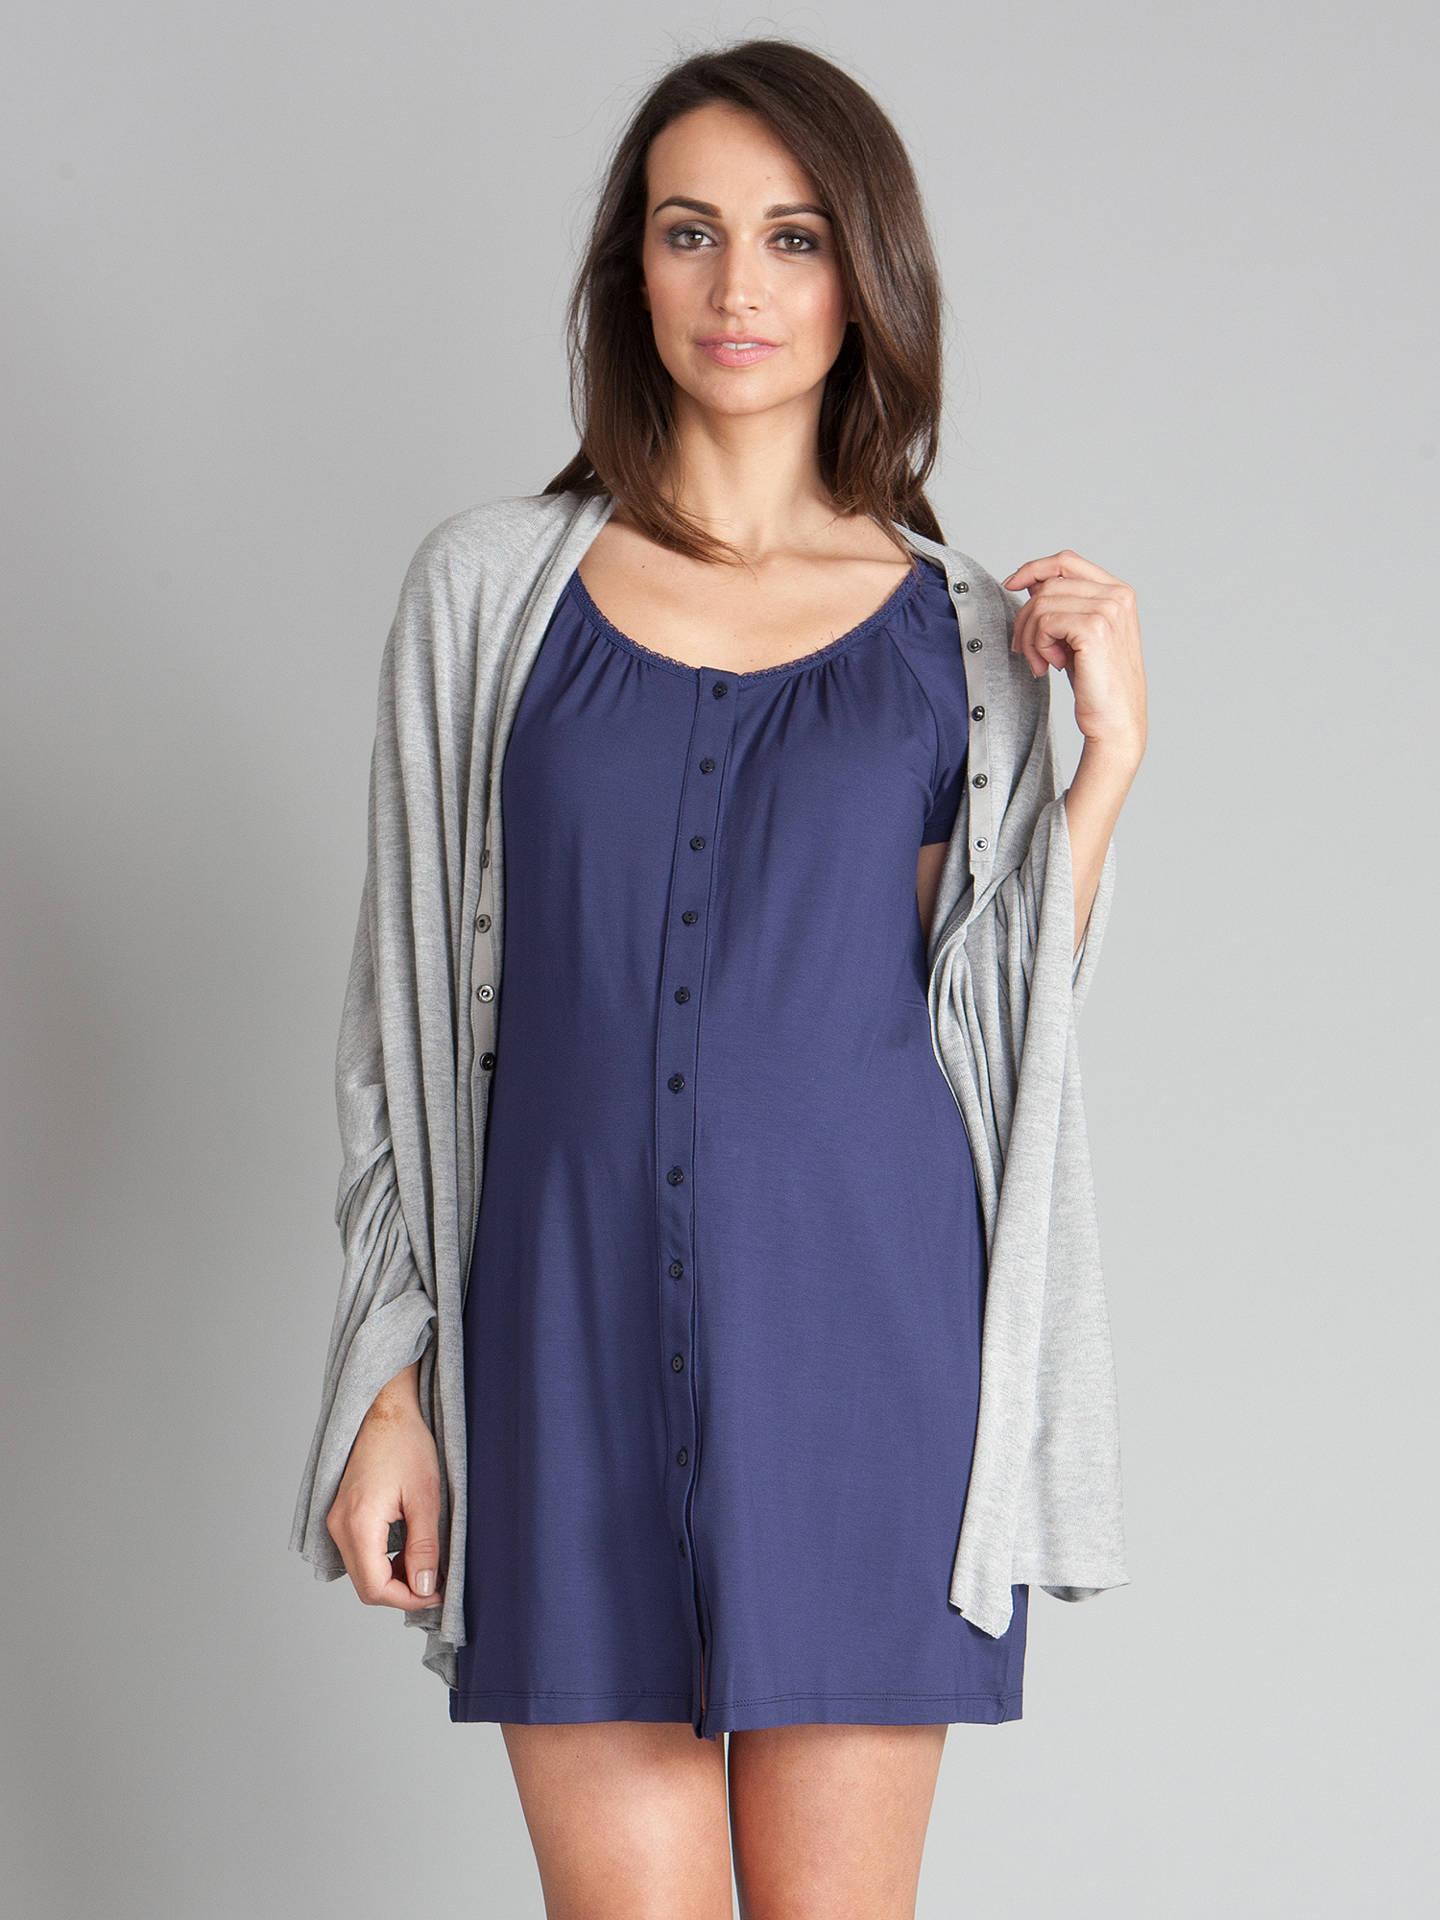 a3ede9c2743b2 ... Buy Séraphine Gemma Button Down Maternity Nightie, Navy, 16 Online at  johnlewis.com ...